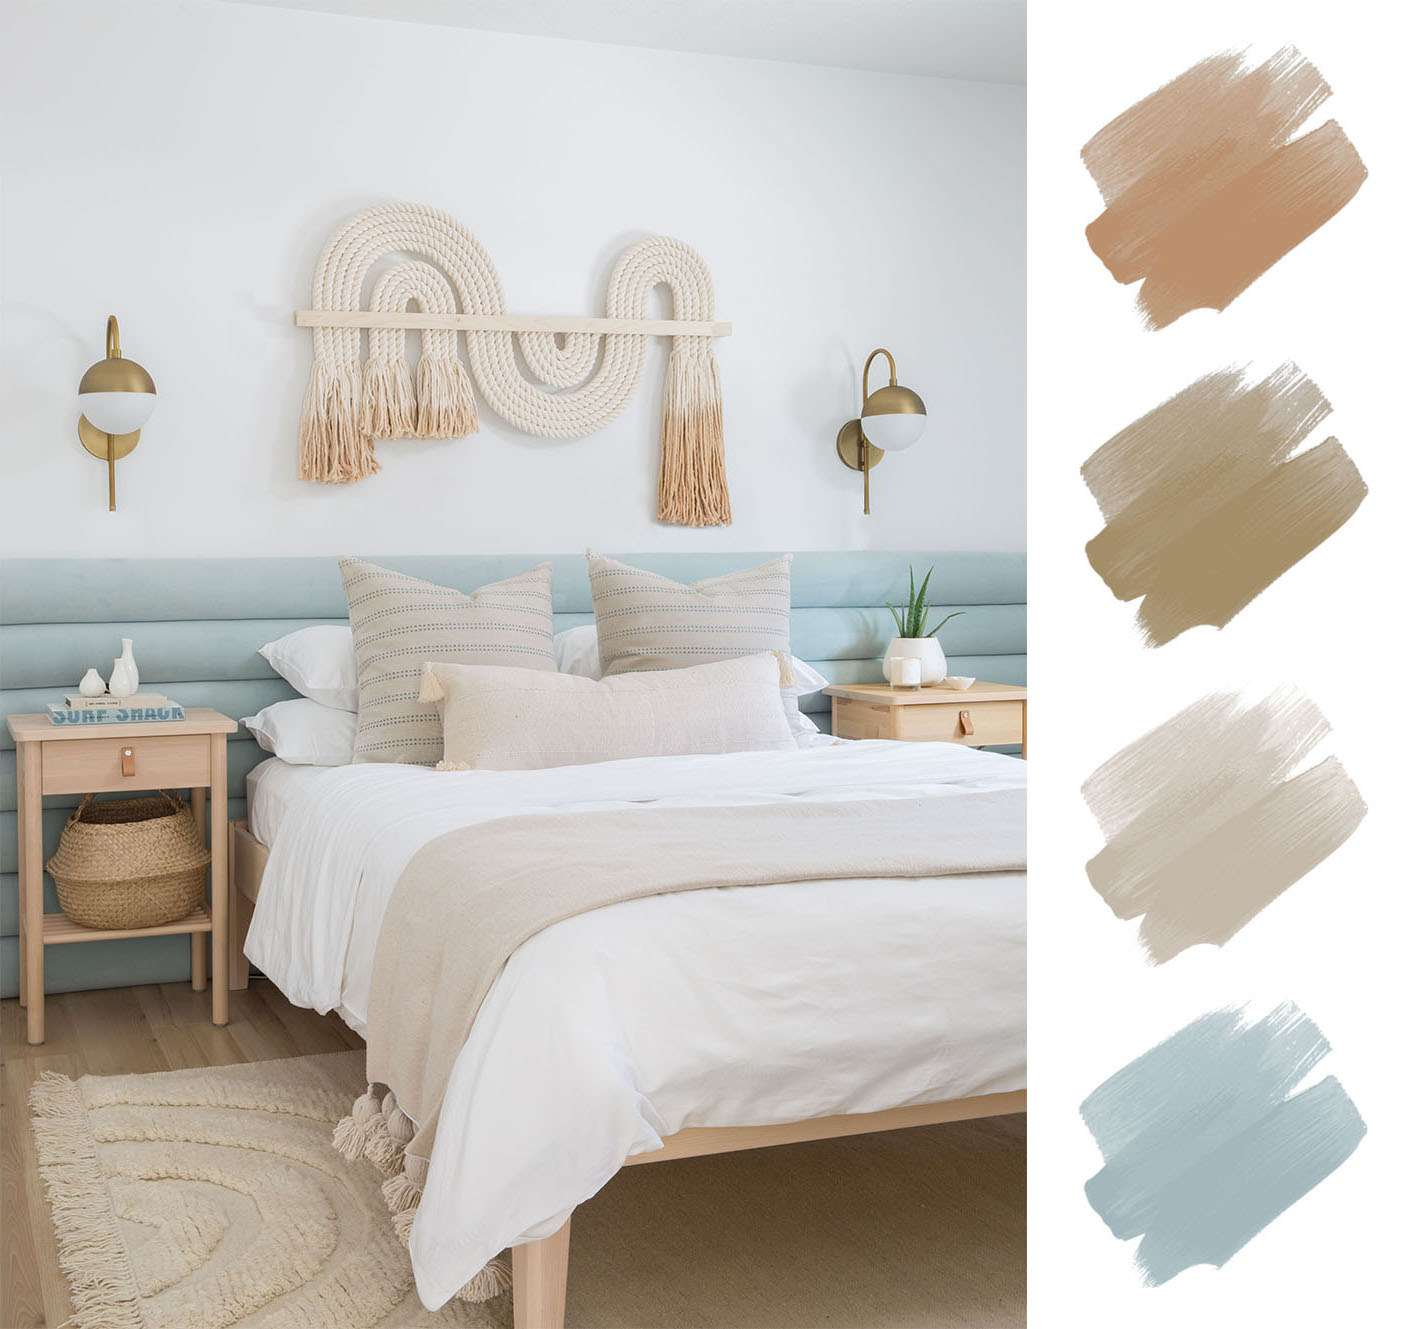 bedroom color palettes - aqua, sand and orange